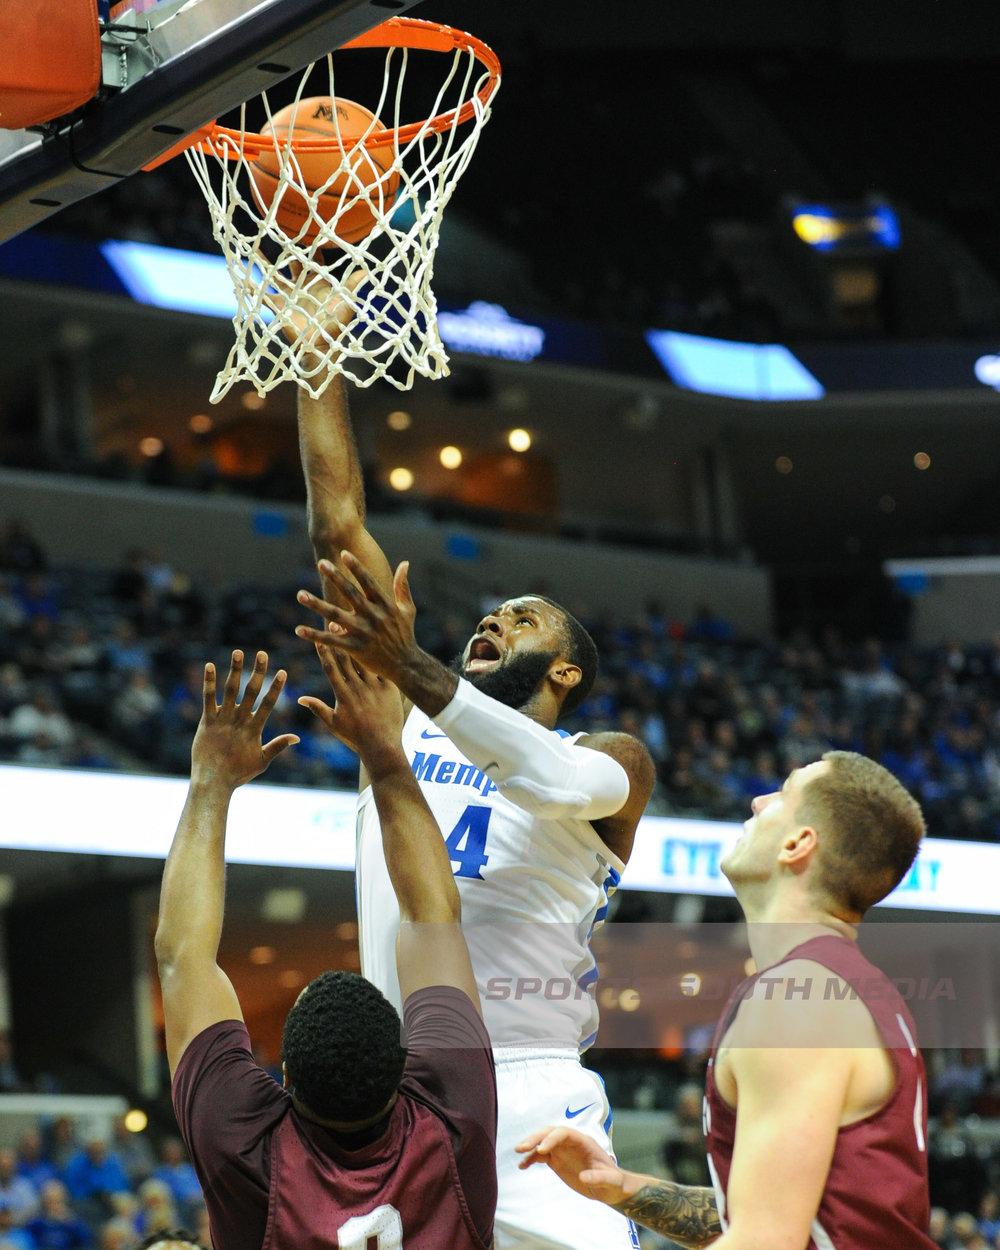 DEC 19; Memphis beats Little Rock, 99-89